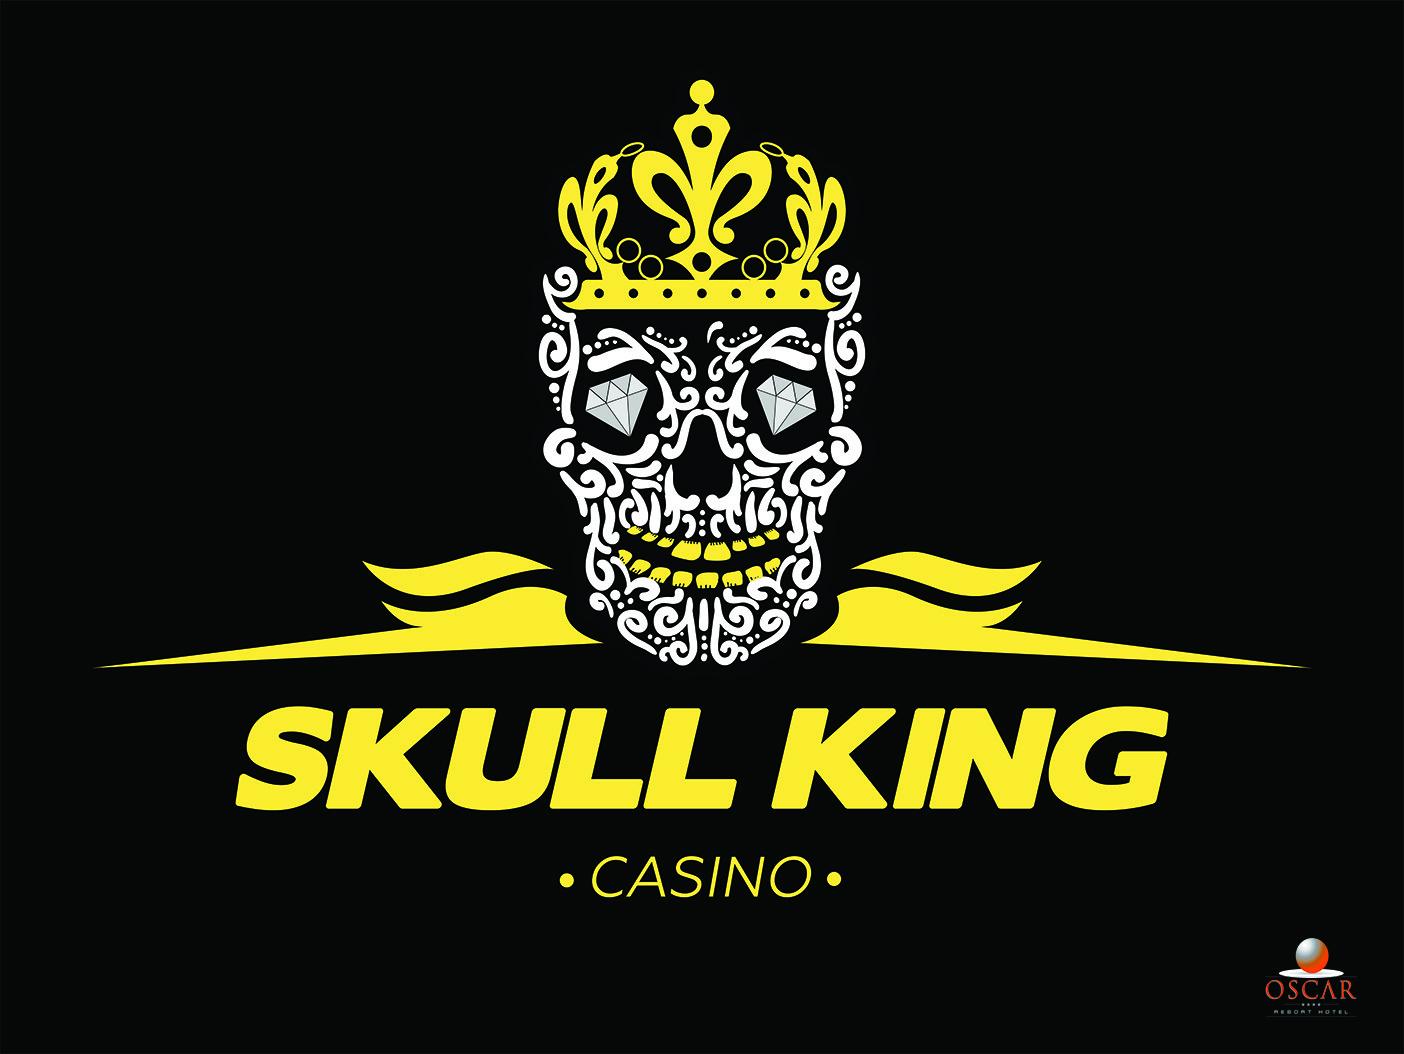 skullkingcasino